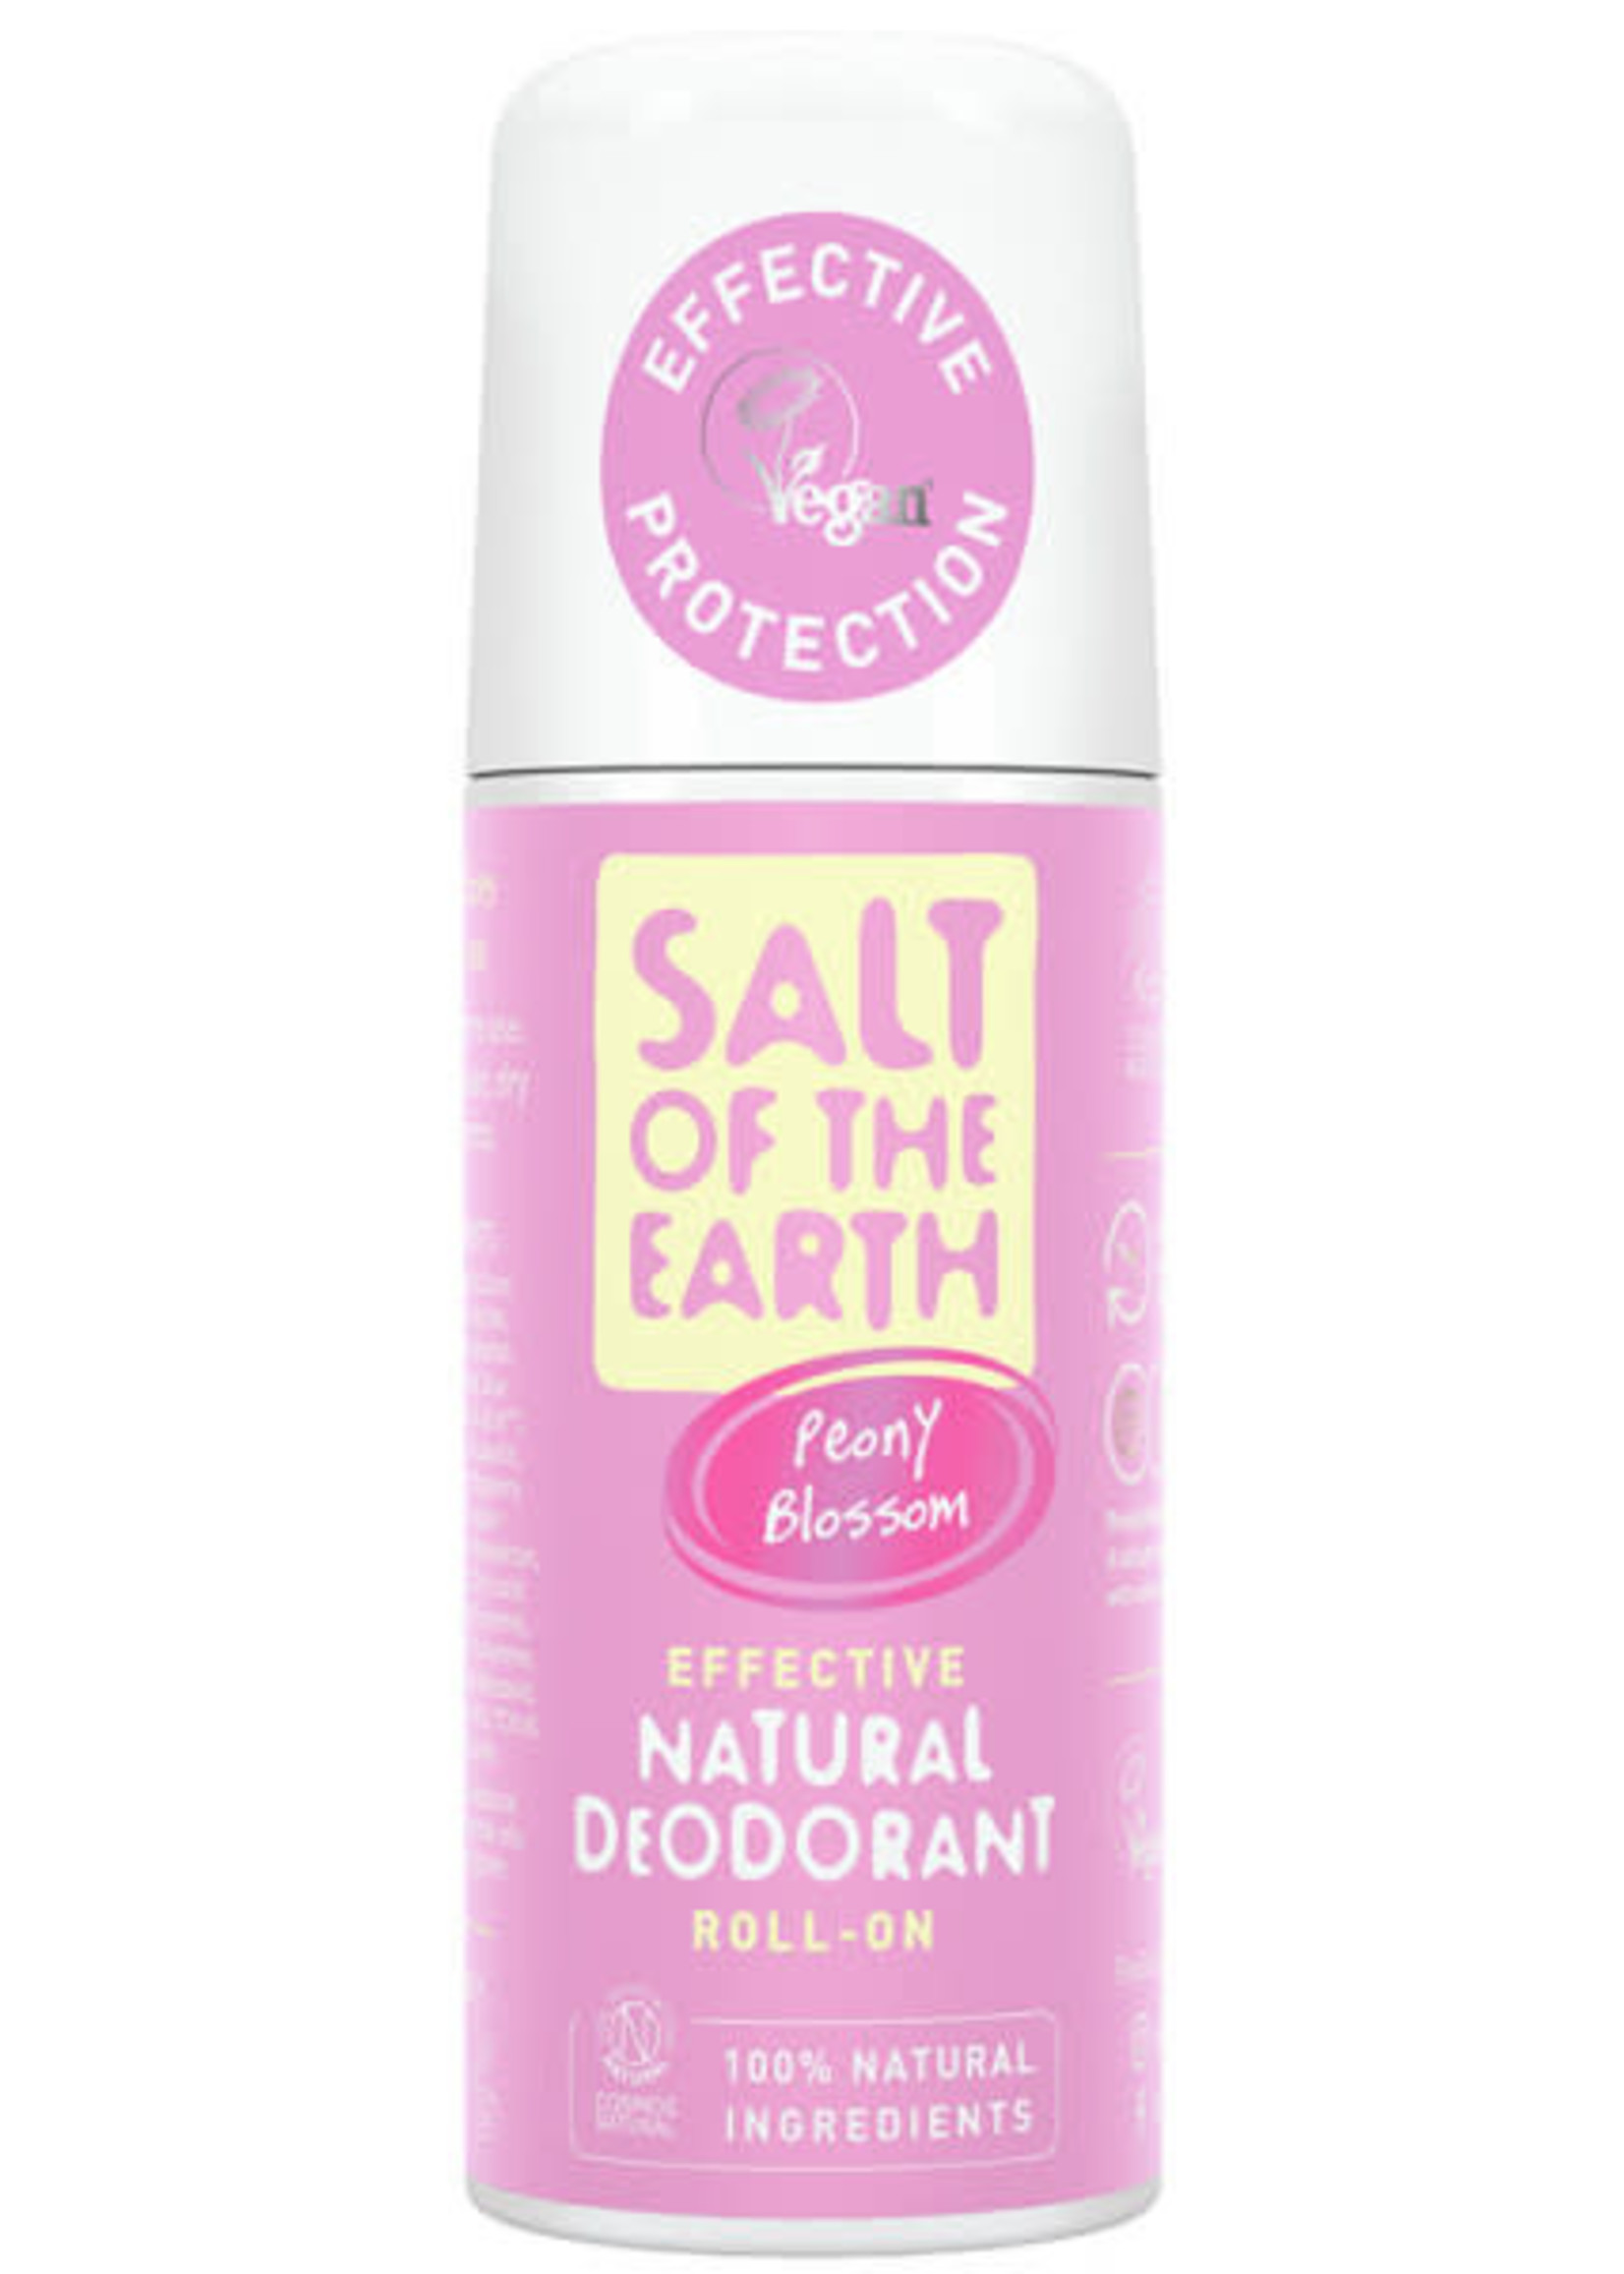 Deodorant roll-on - Peony blossom